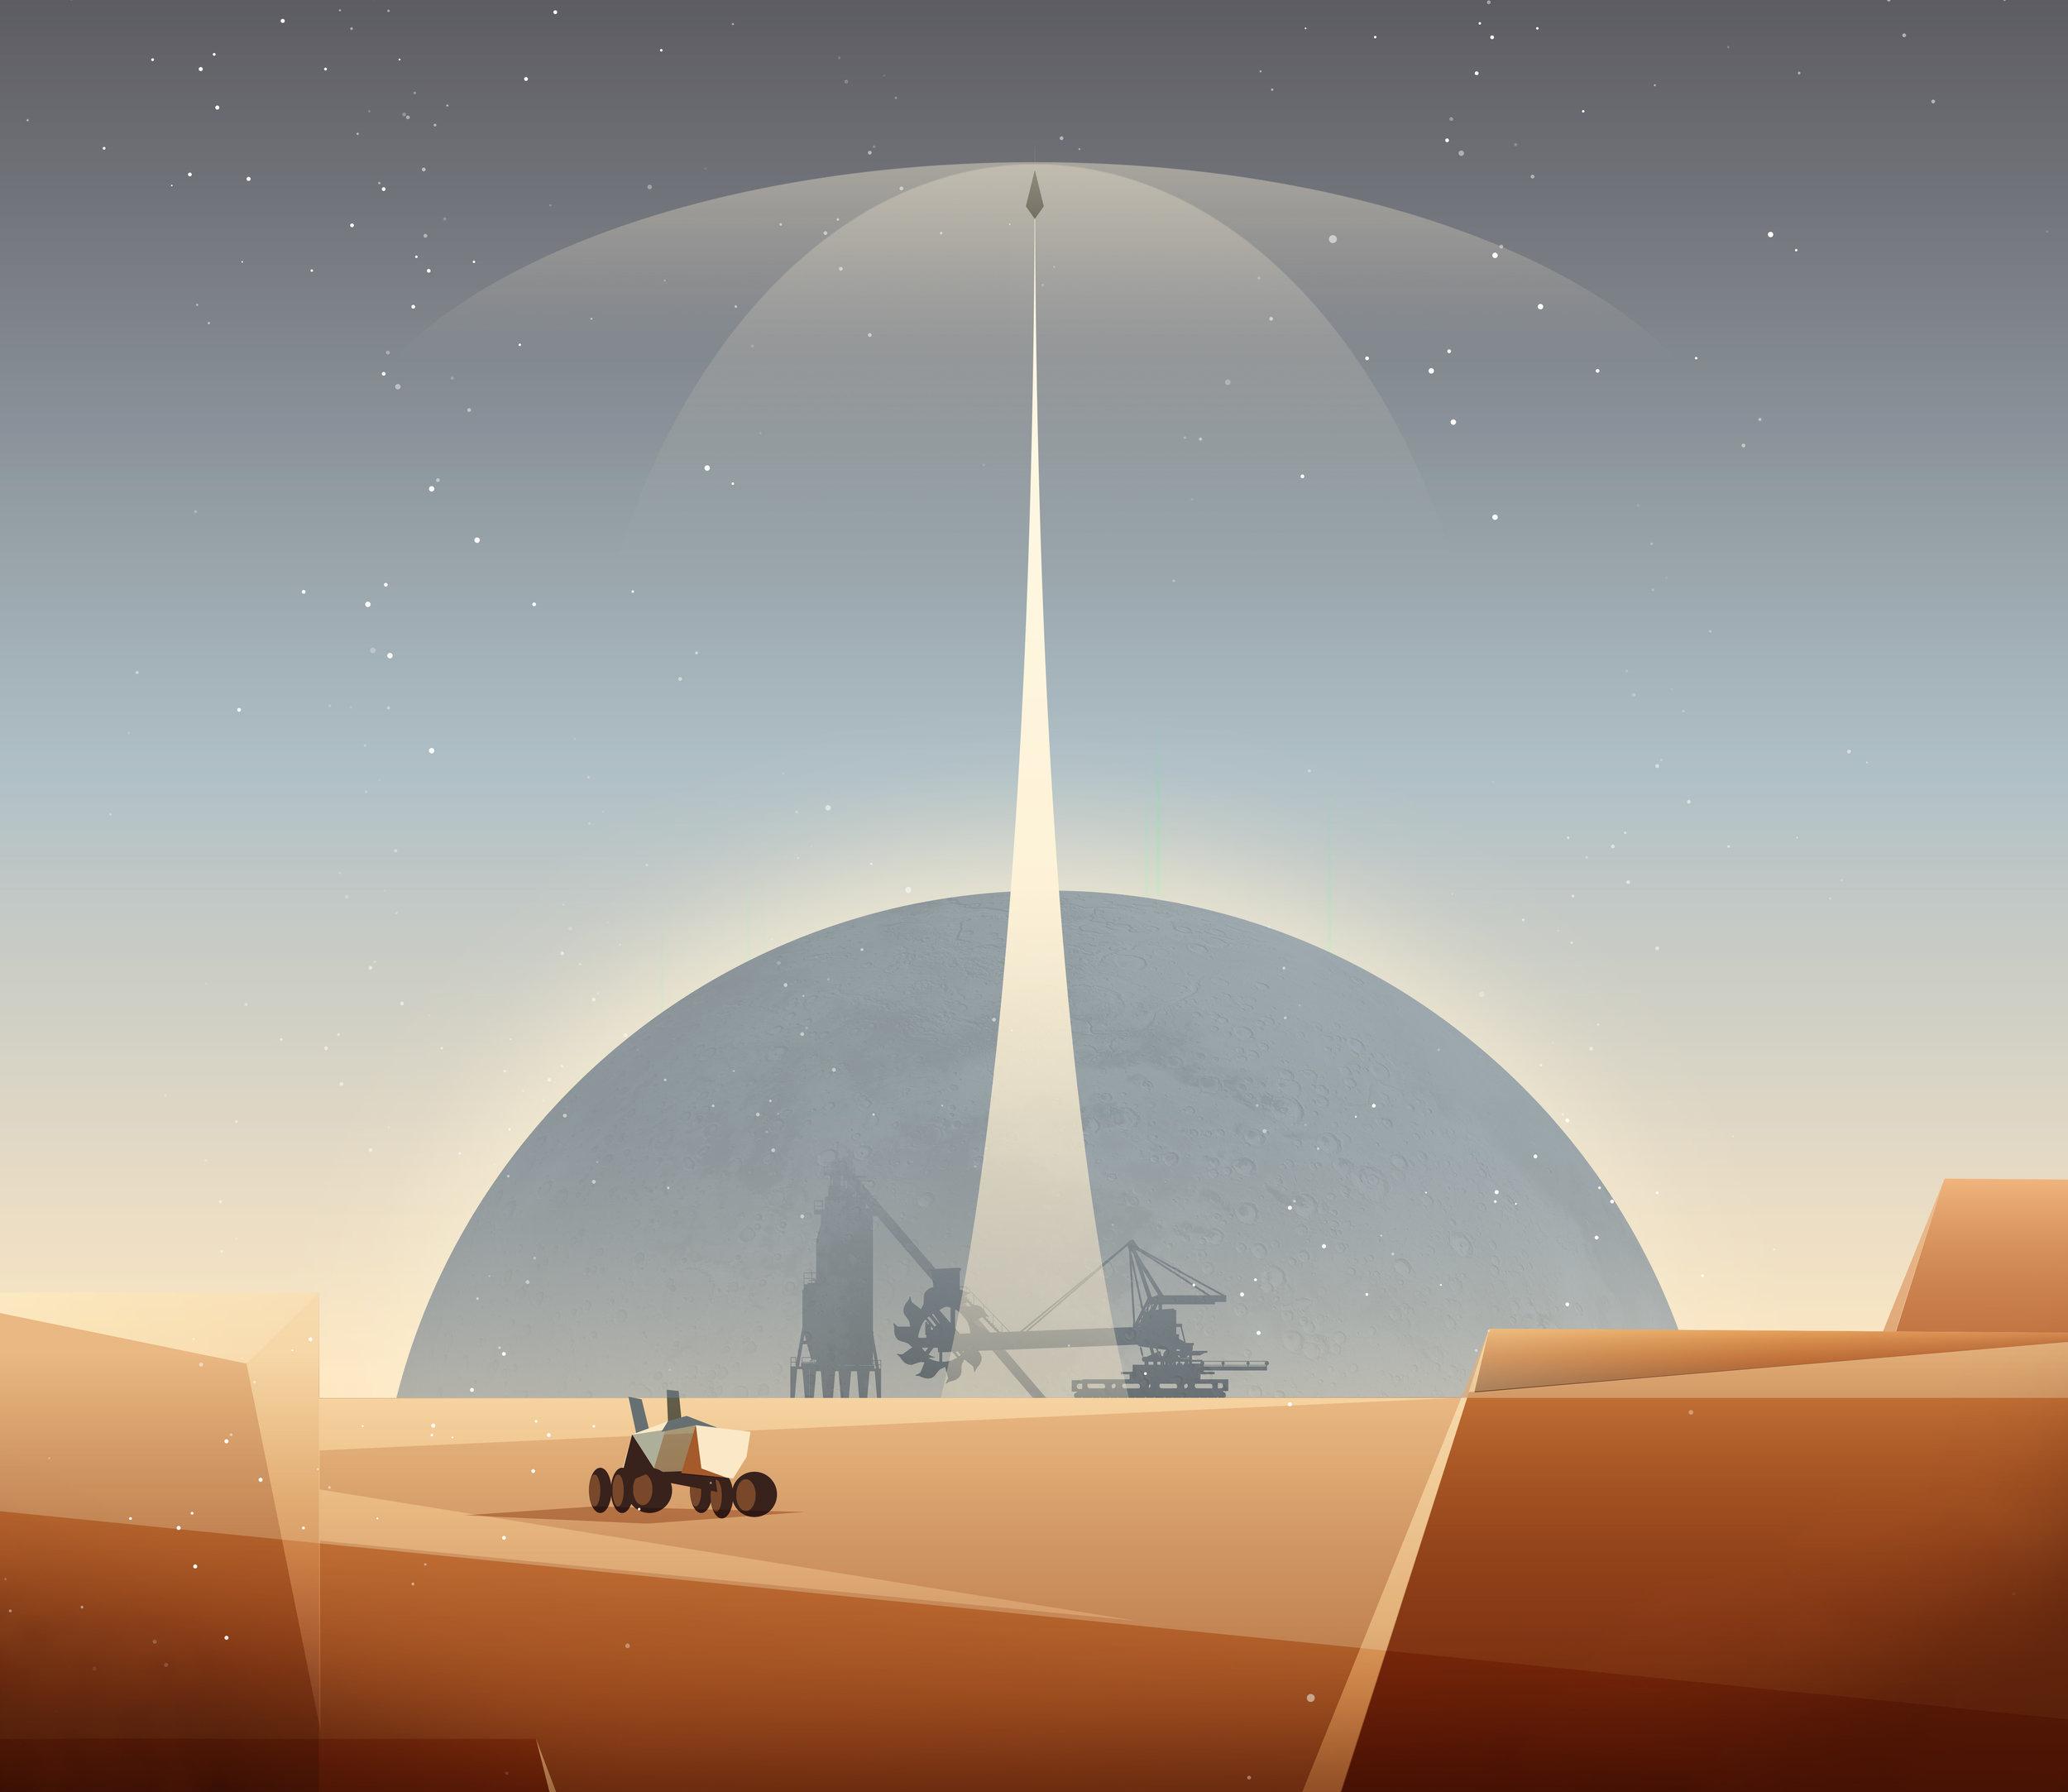 Mining_space_BG-1_r2.jpg